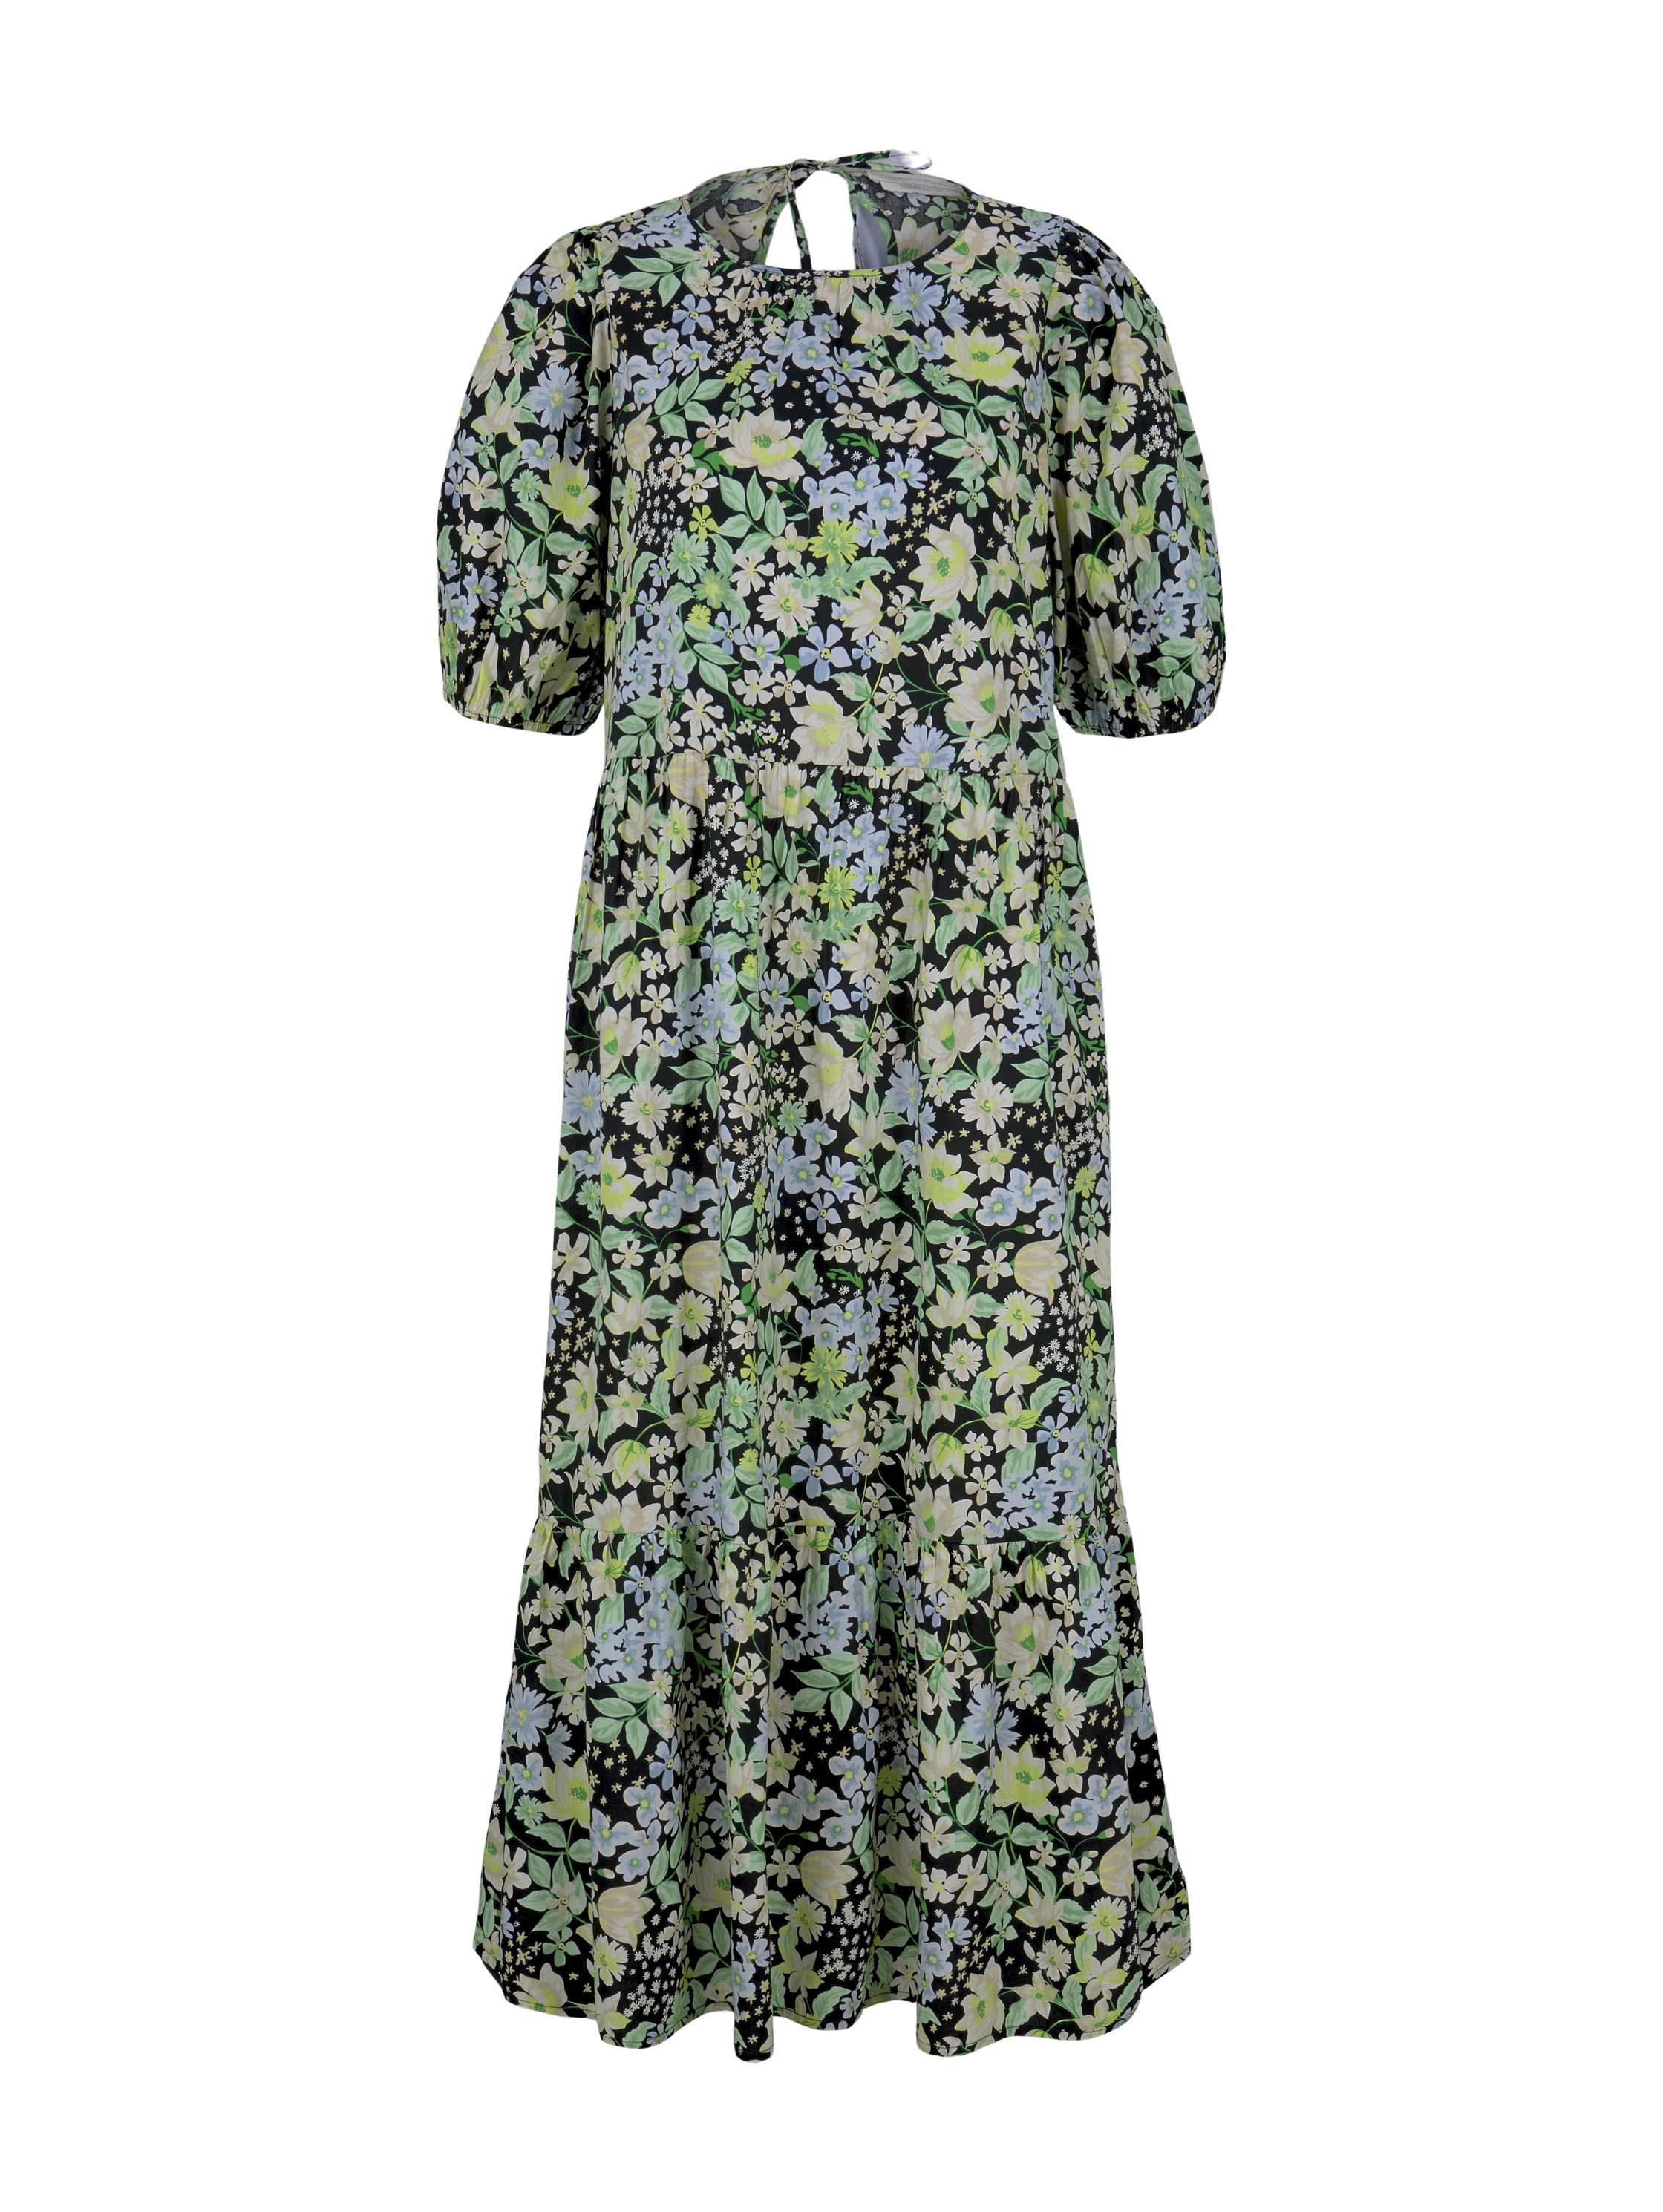 balloon sleeve cotton dress, flower print